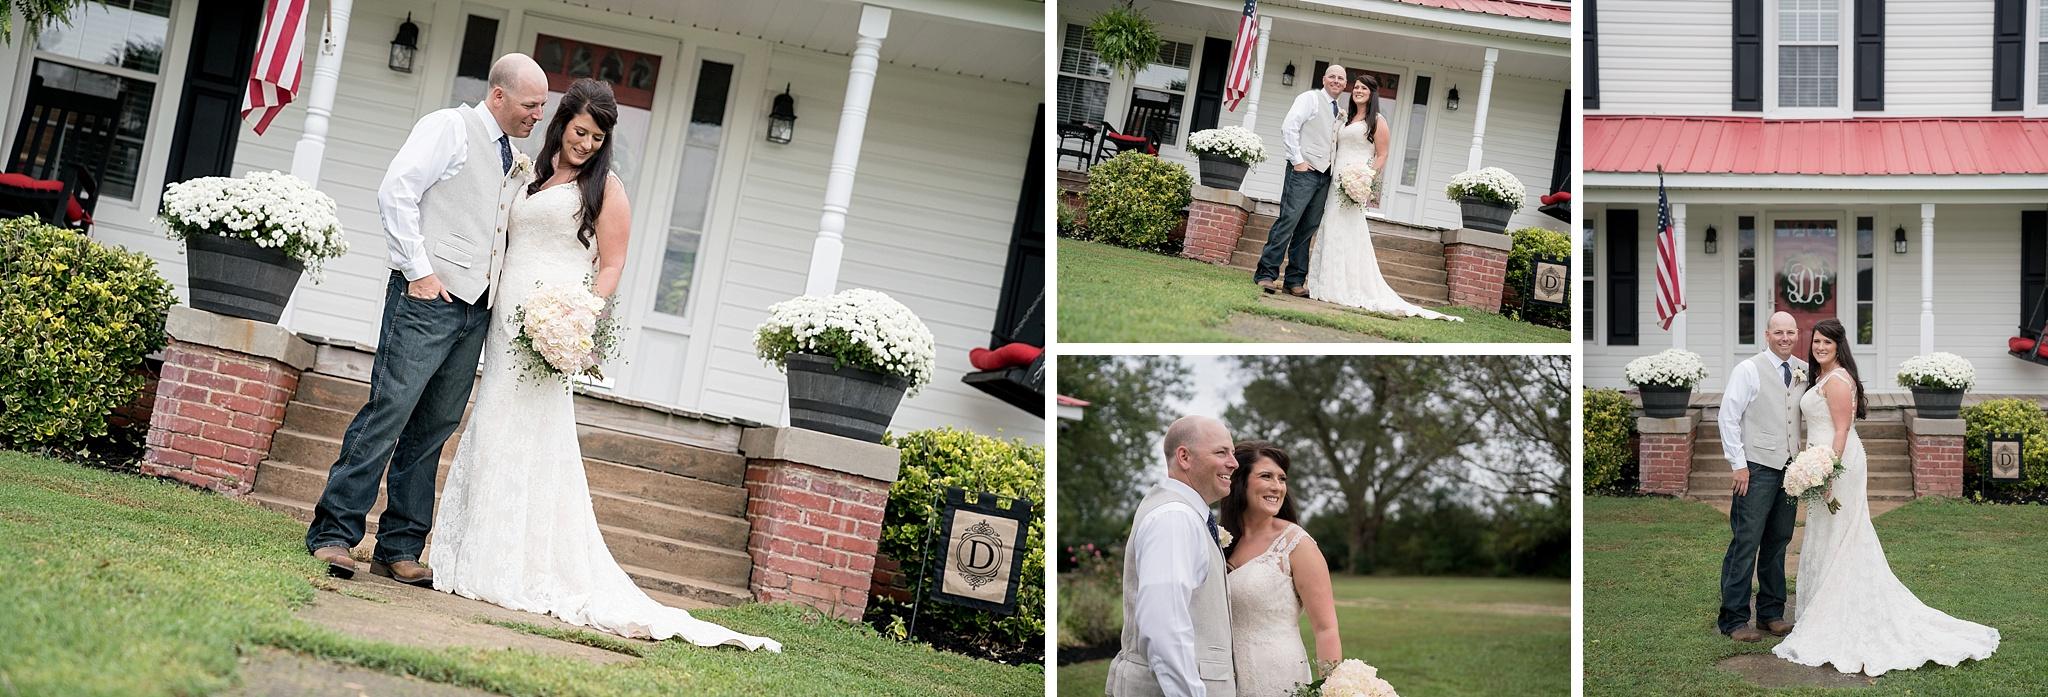 Tarboro-NC-Wedding-Photographer-024.jpg